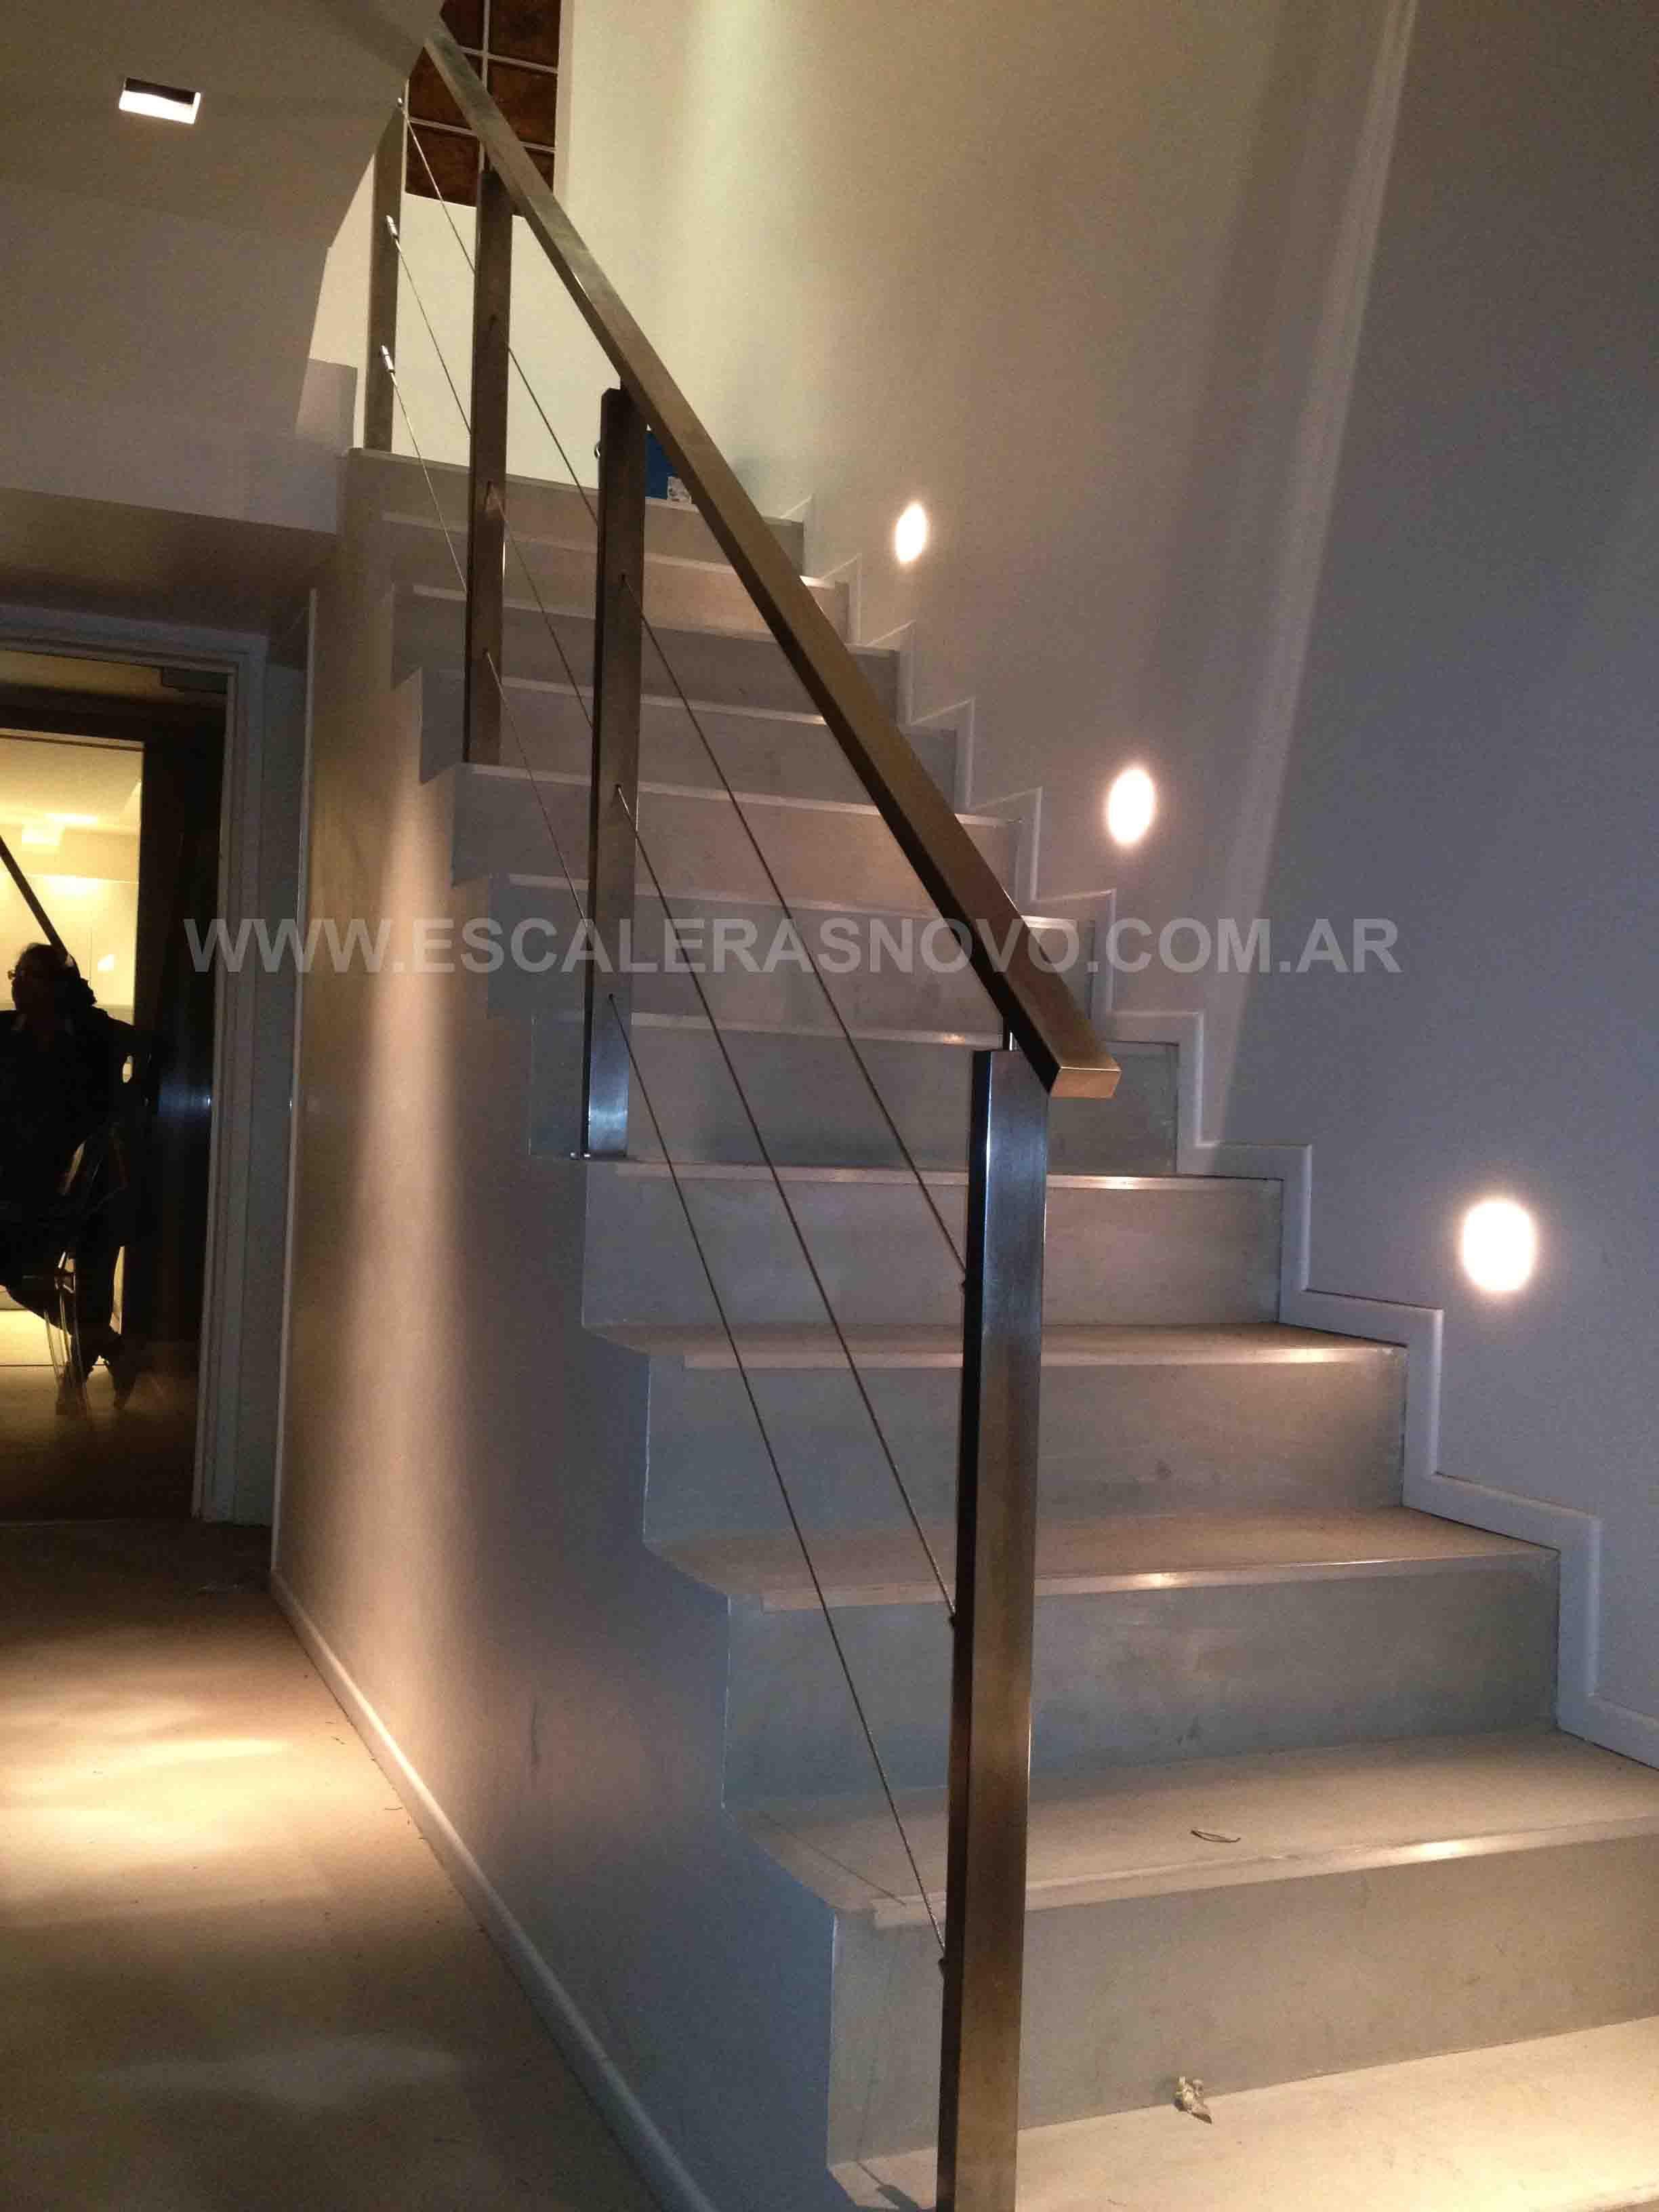 Barandas de acero inoxidable con tensores mod 13 venta de escaleras y barandas novo design - Barandas para escaleras ...